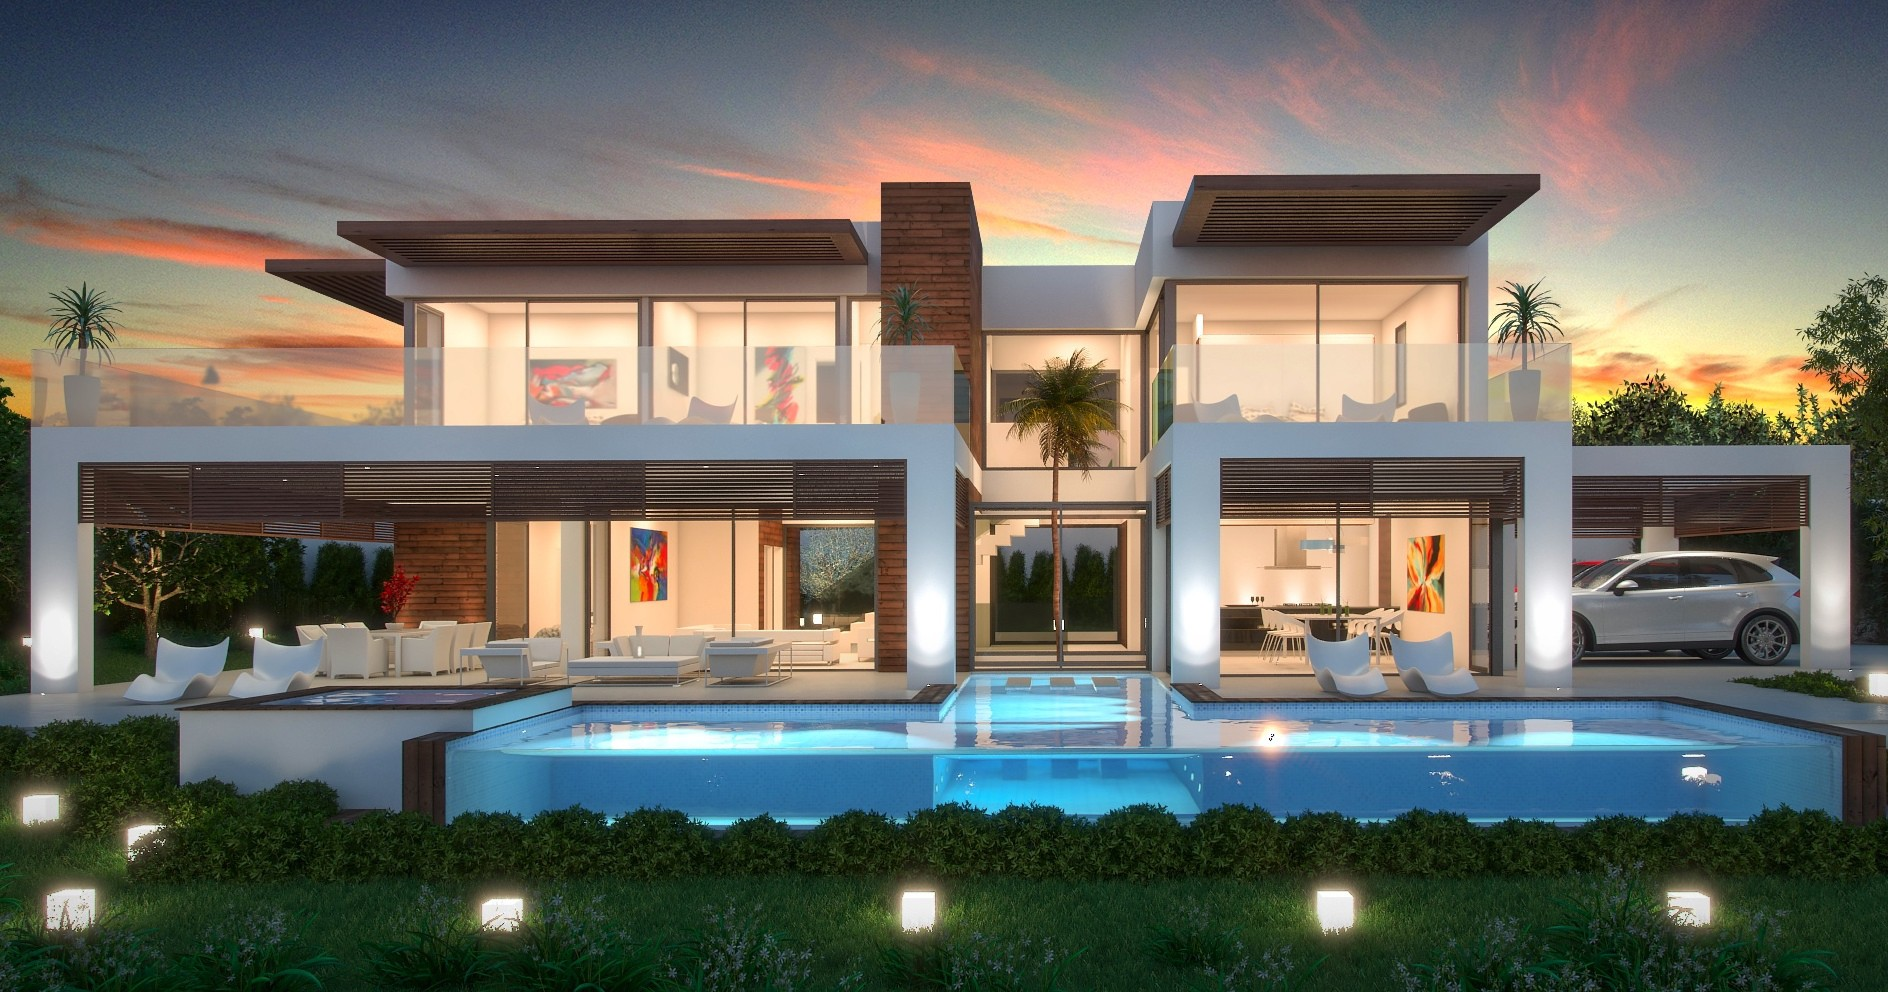 Los belvederes 36a global estate international for Villa de luxe moderne